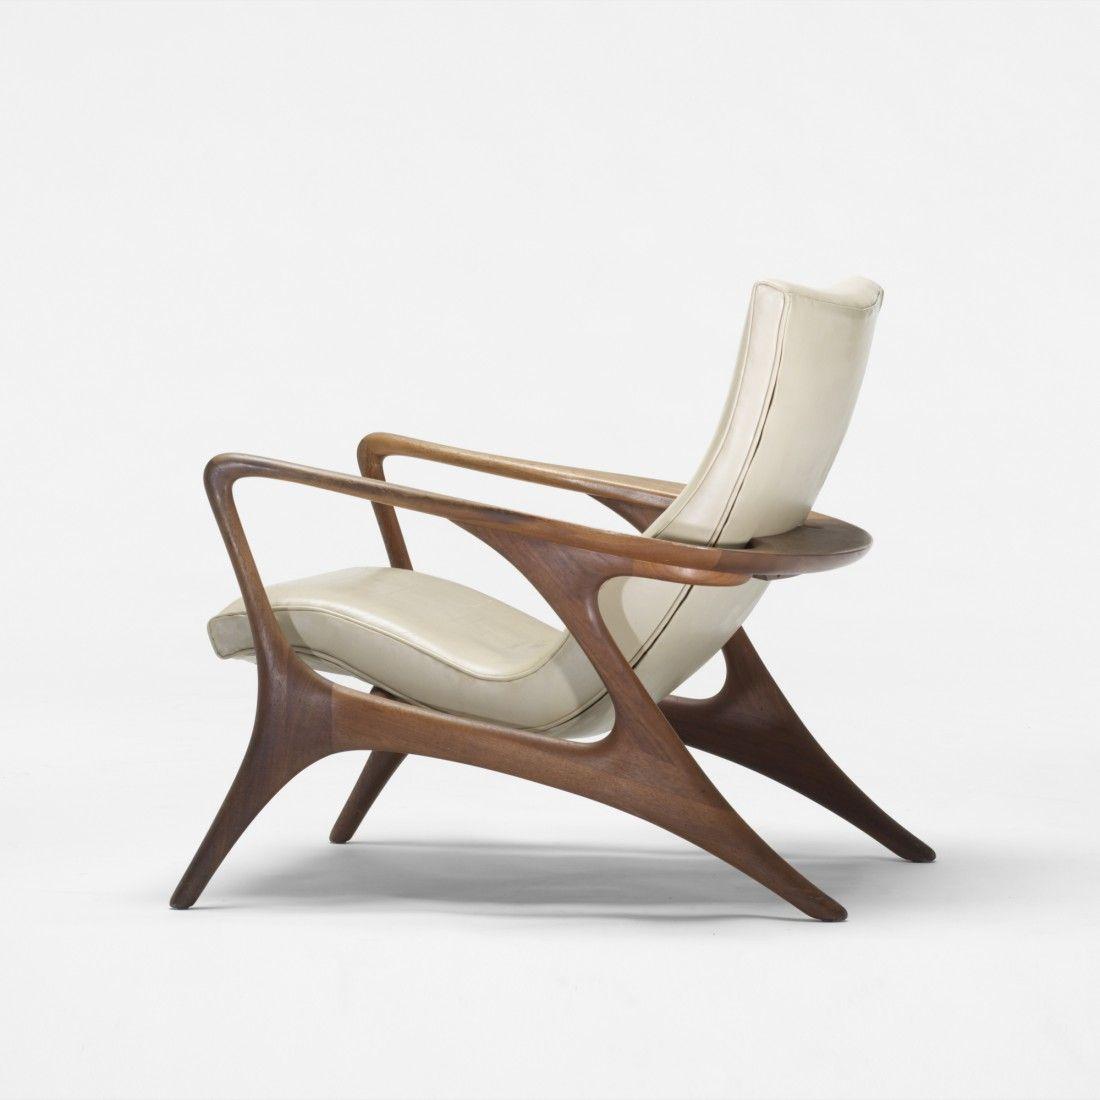 Vladimir kagan contour lounge chair